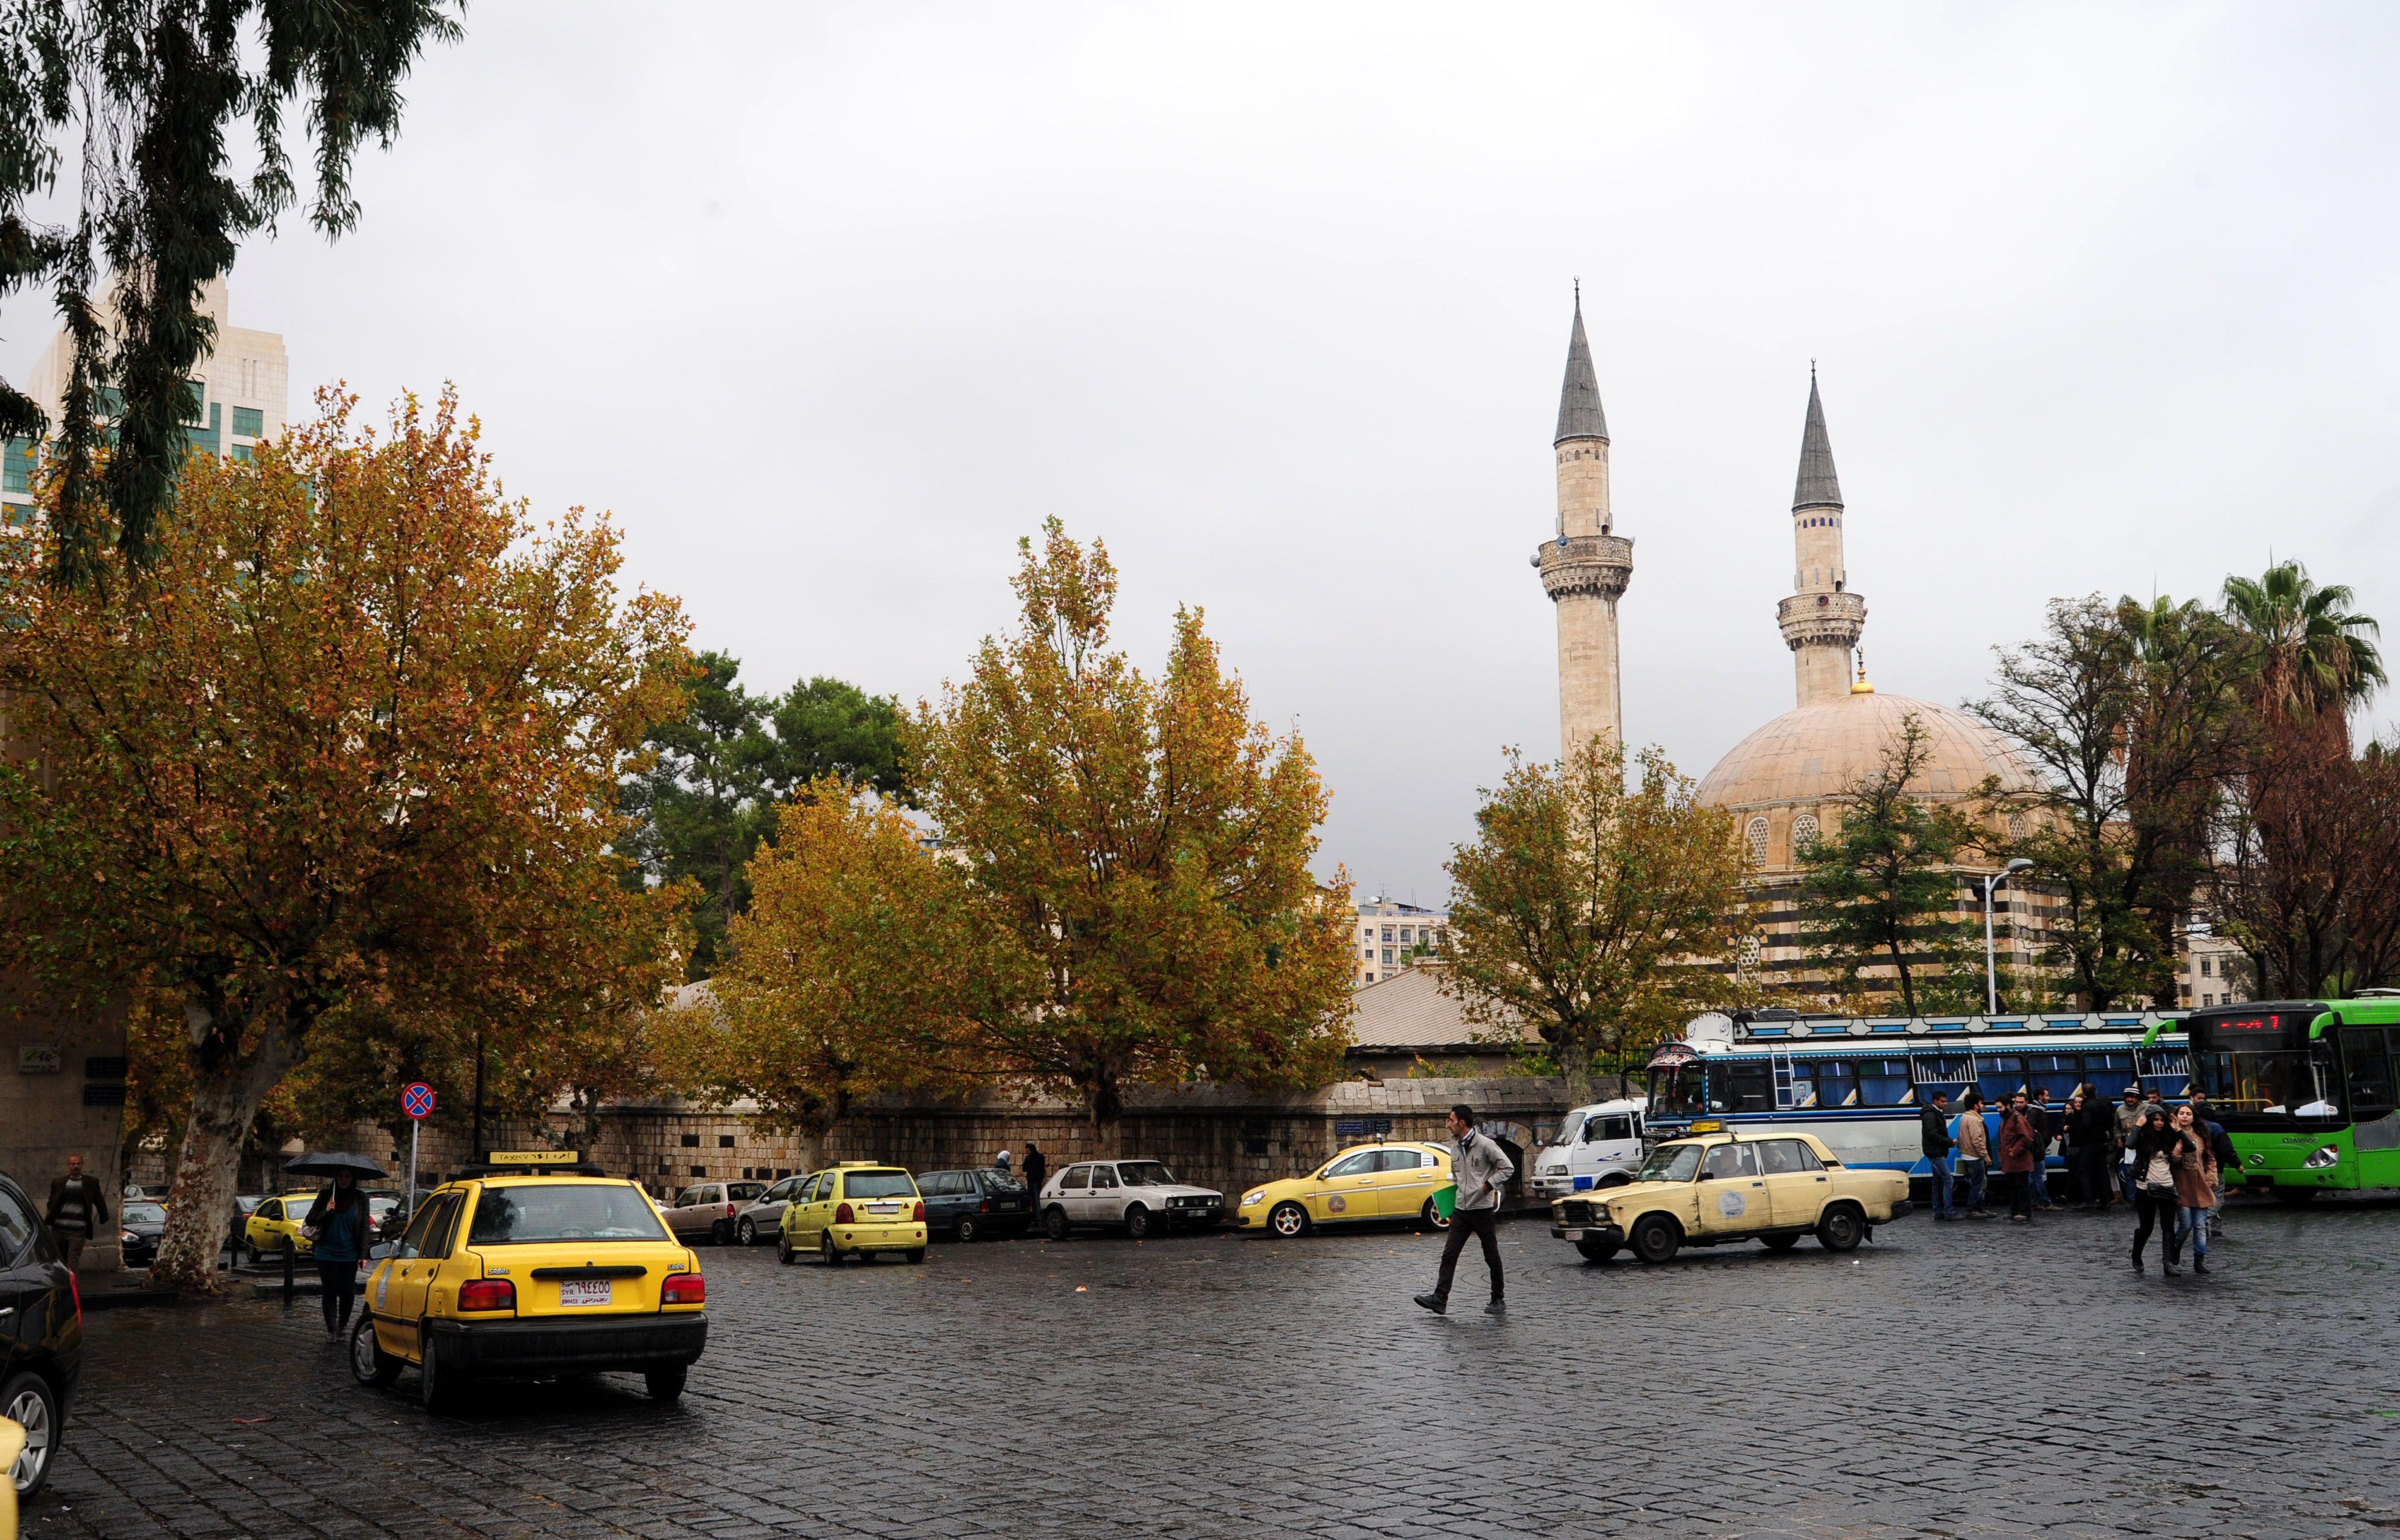 أمطار دمشق 26-11-2014 – S A N A